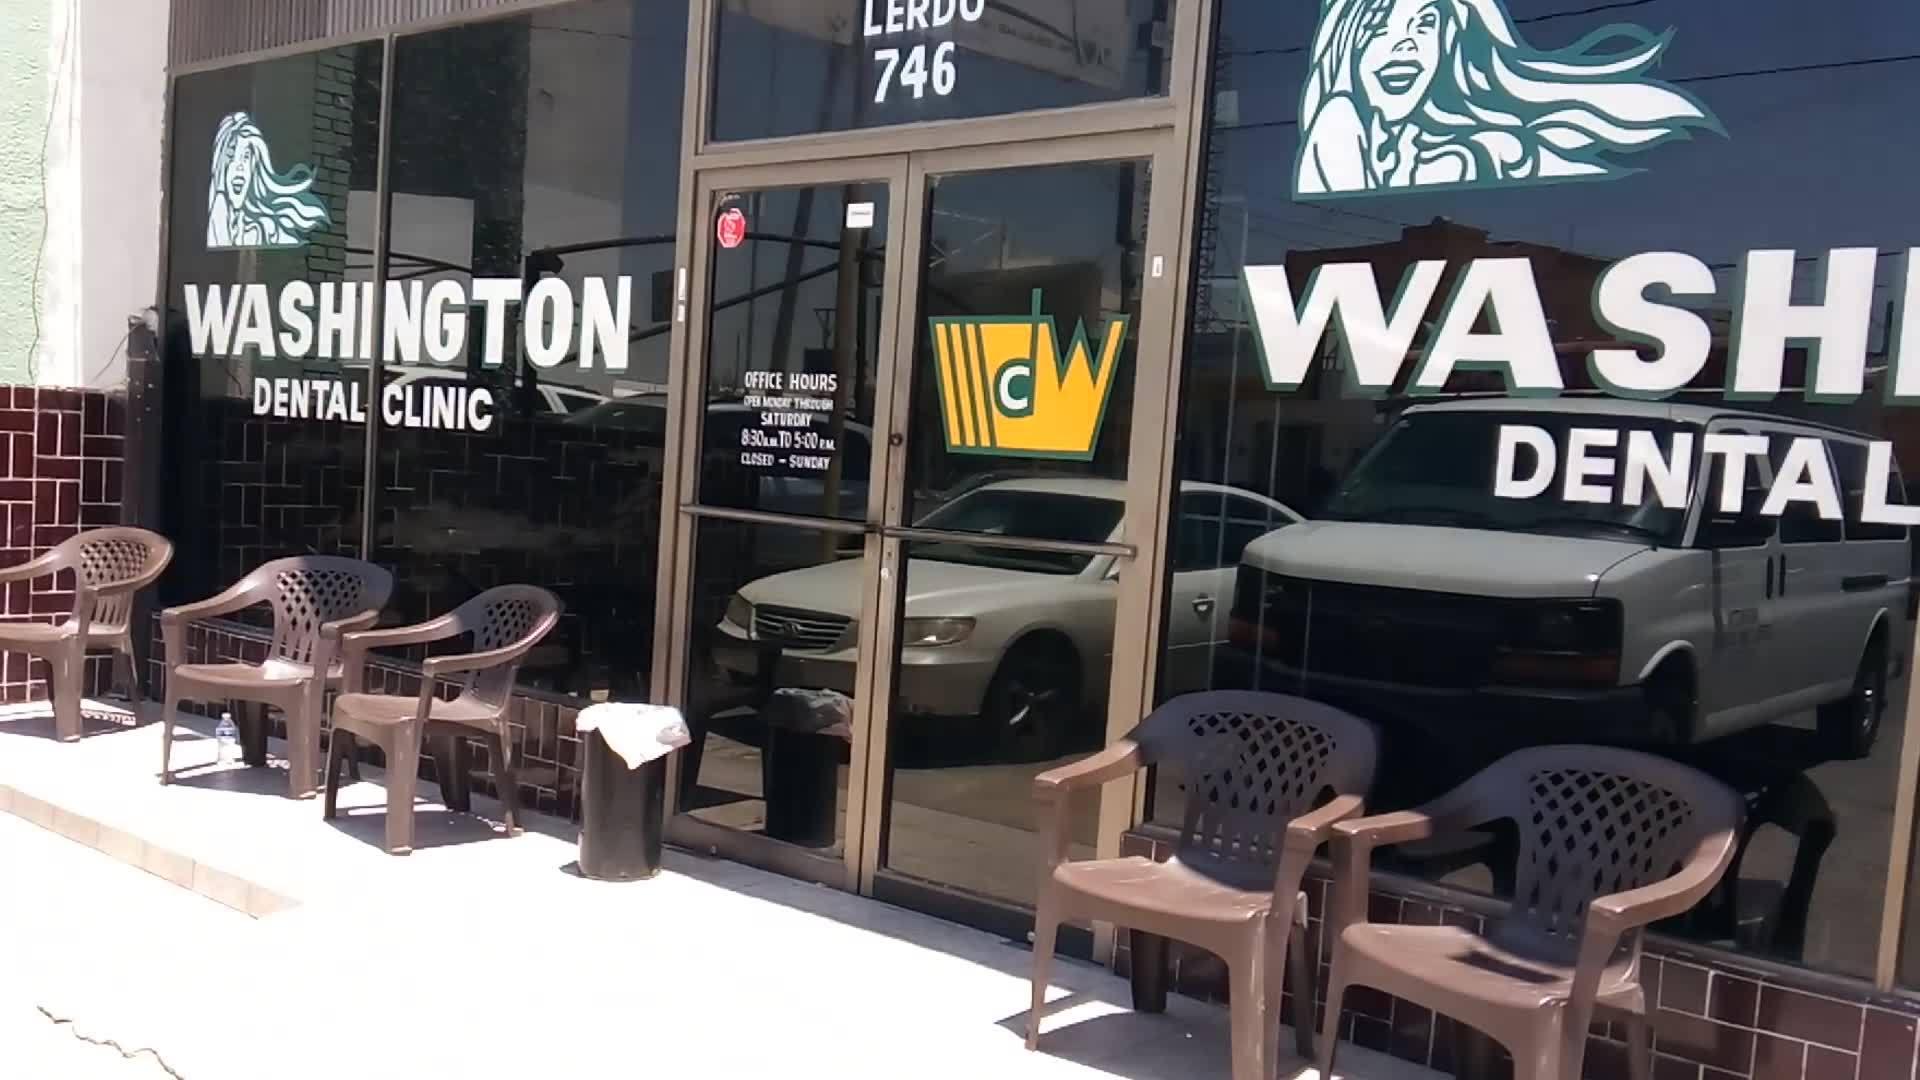 Washington_Dental_vans_bus_Americans_acr_1_20190605150808